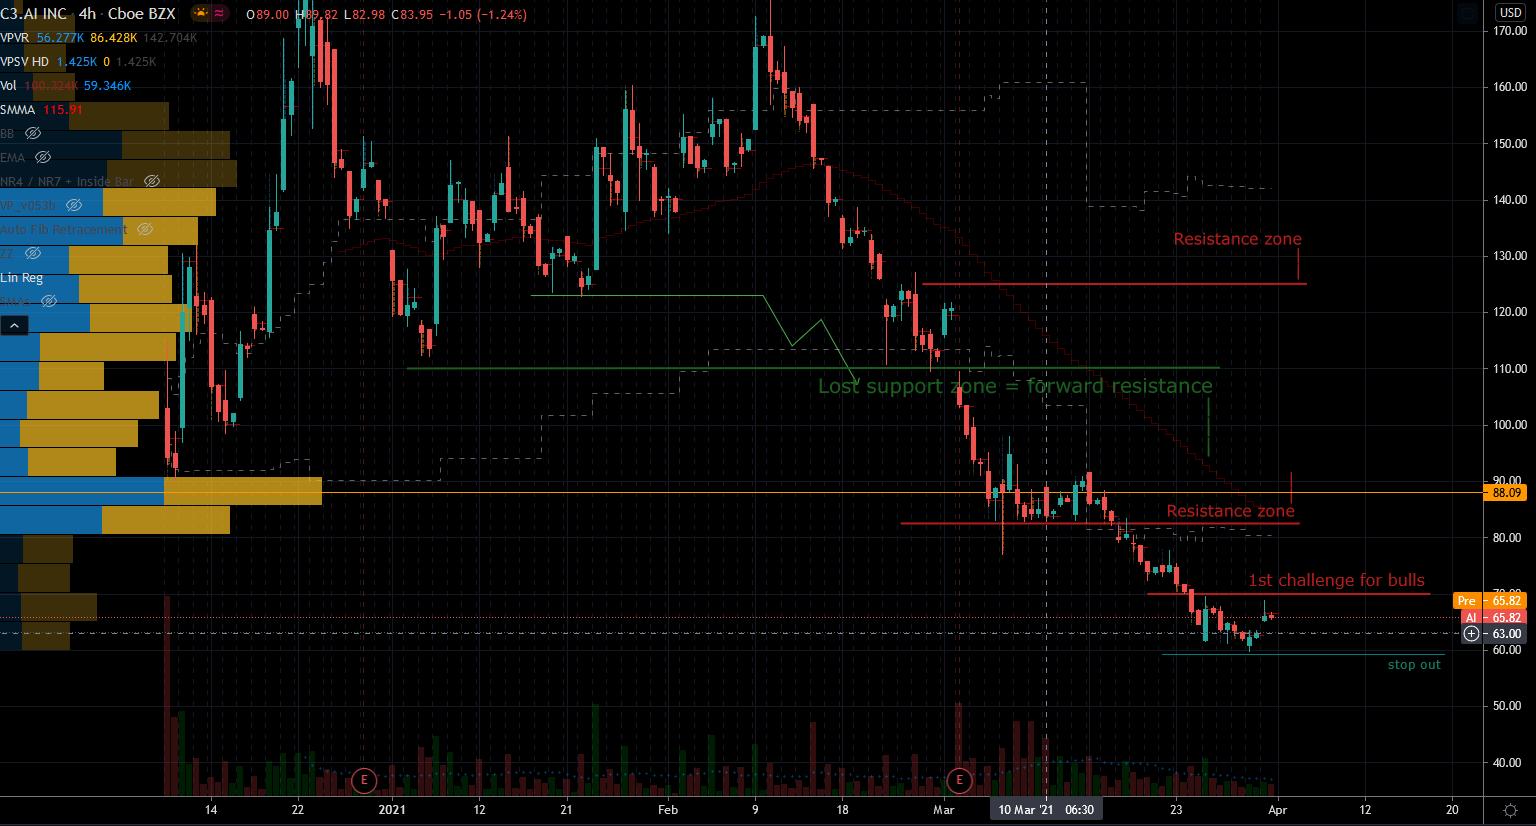 AI Stocks: C3.Ai (AI) Stock Chart Showing Upside Opportunity